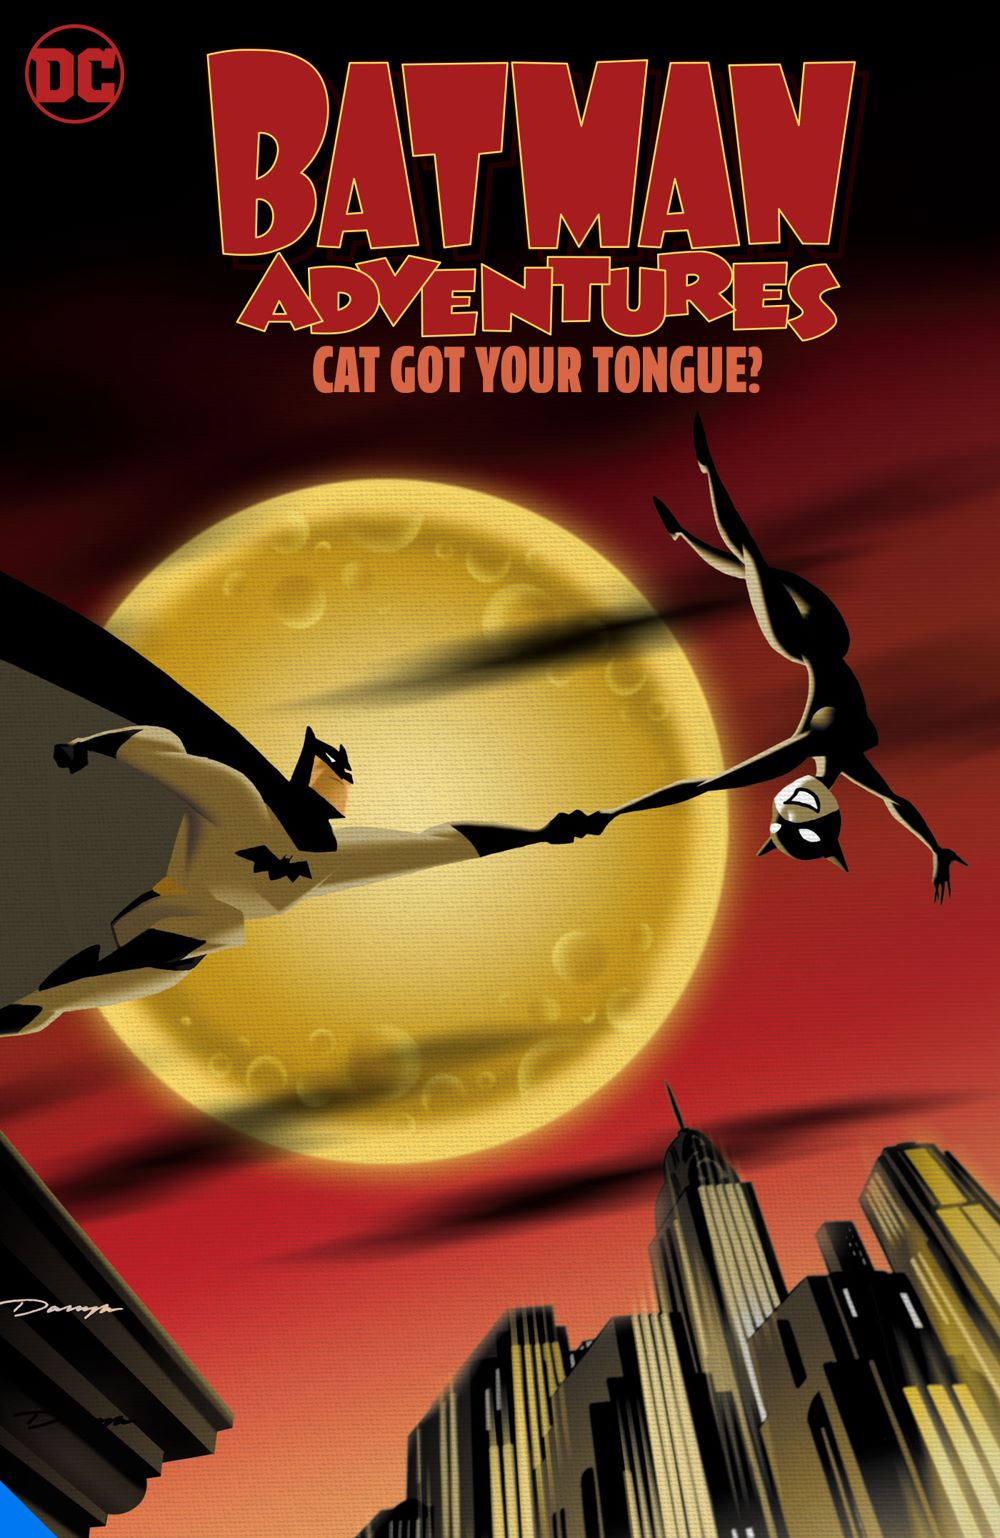 batmanadventurescatgotyourtongue_adv DC Comics July 2021 Solicitations